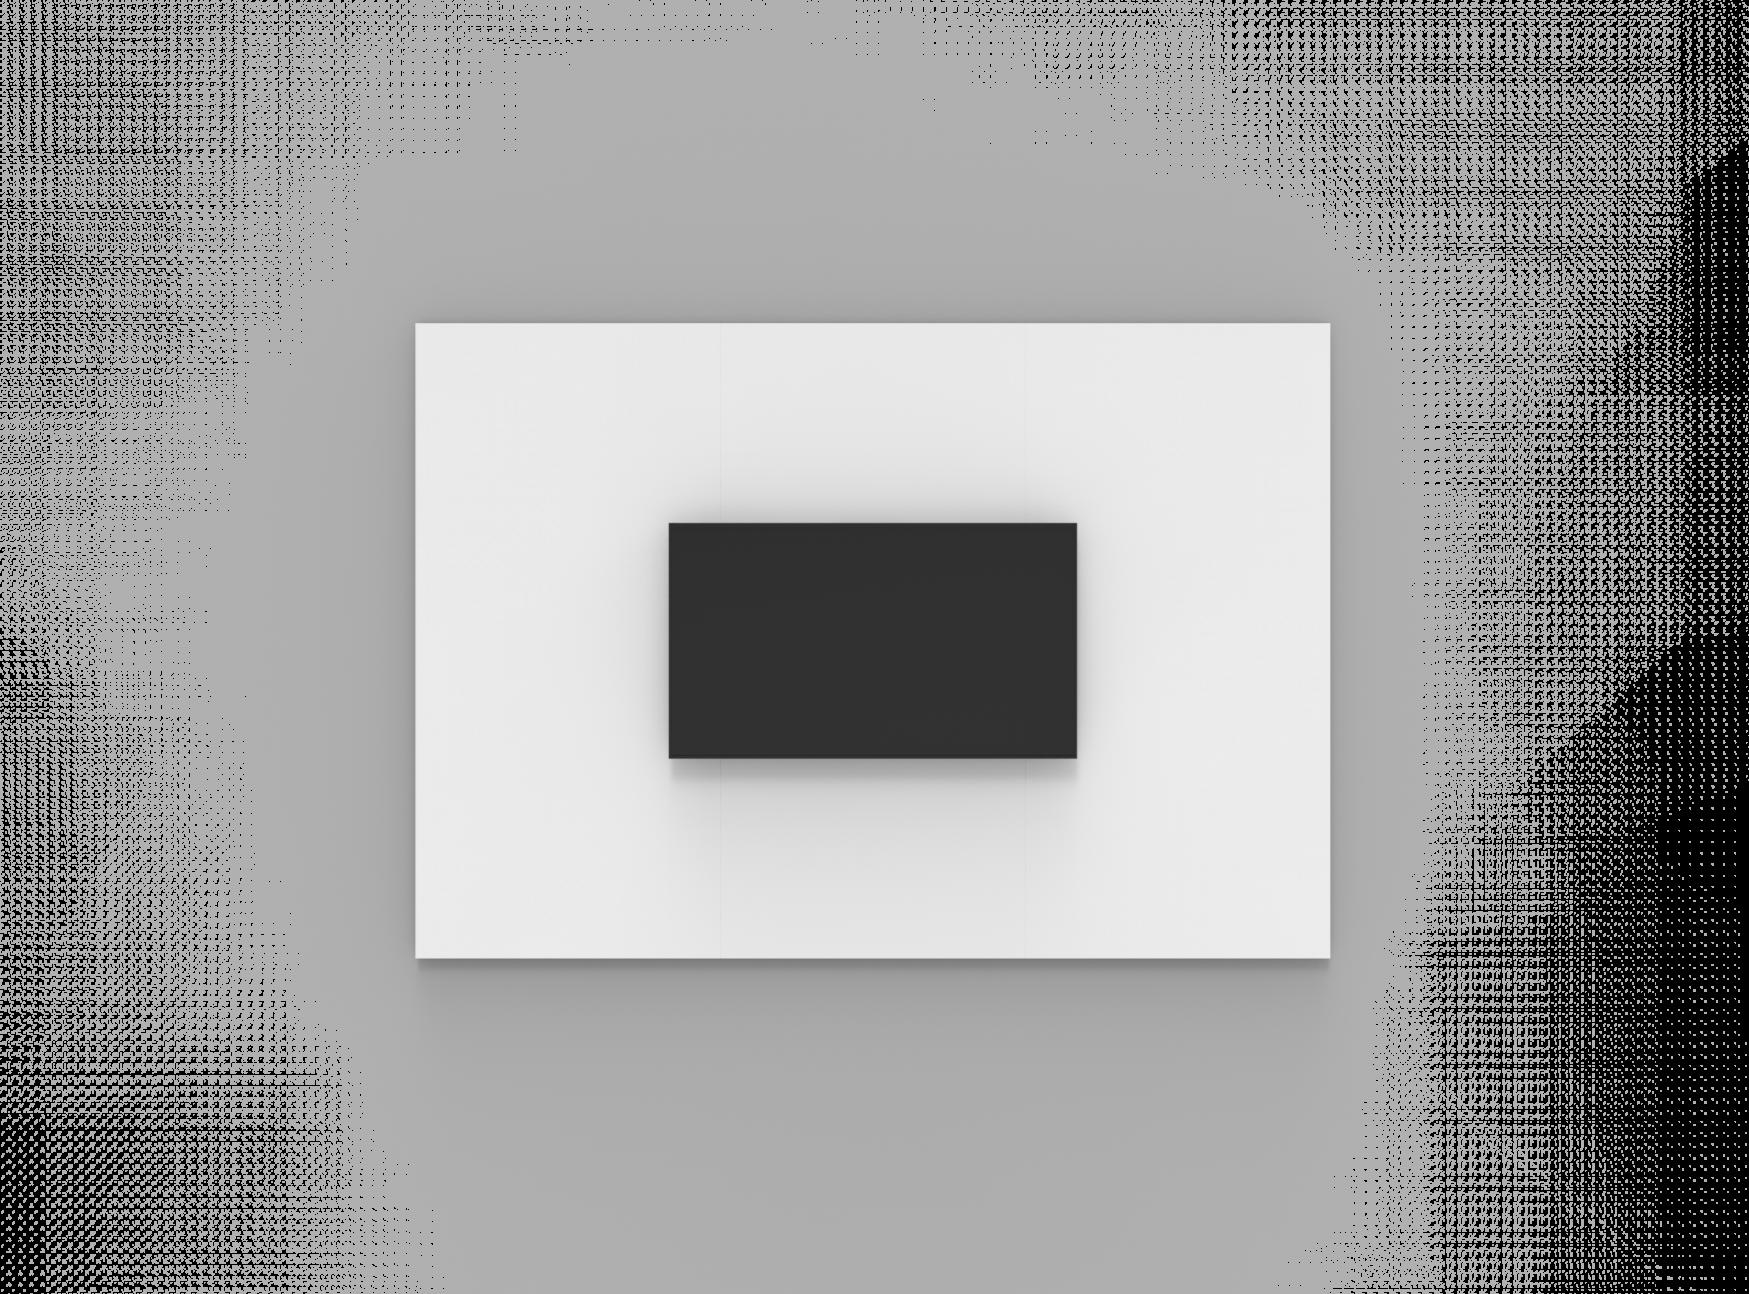 3570 x 2490